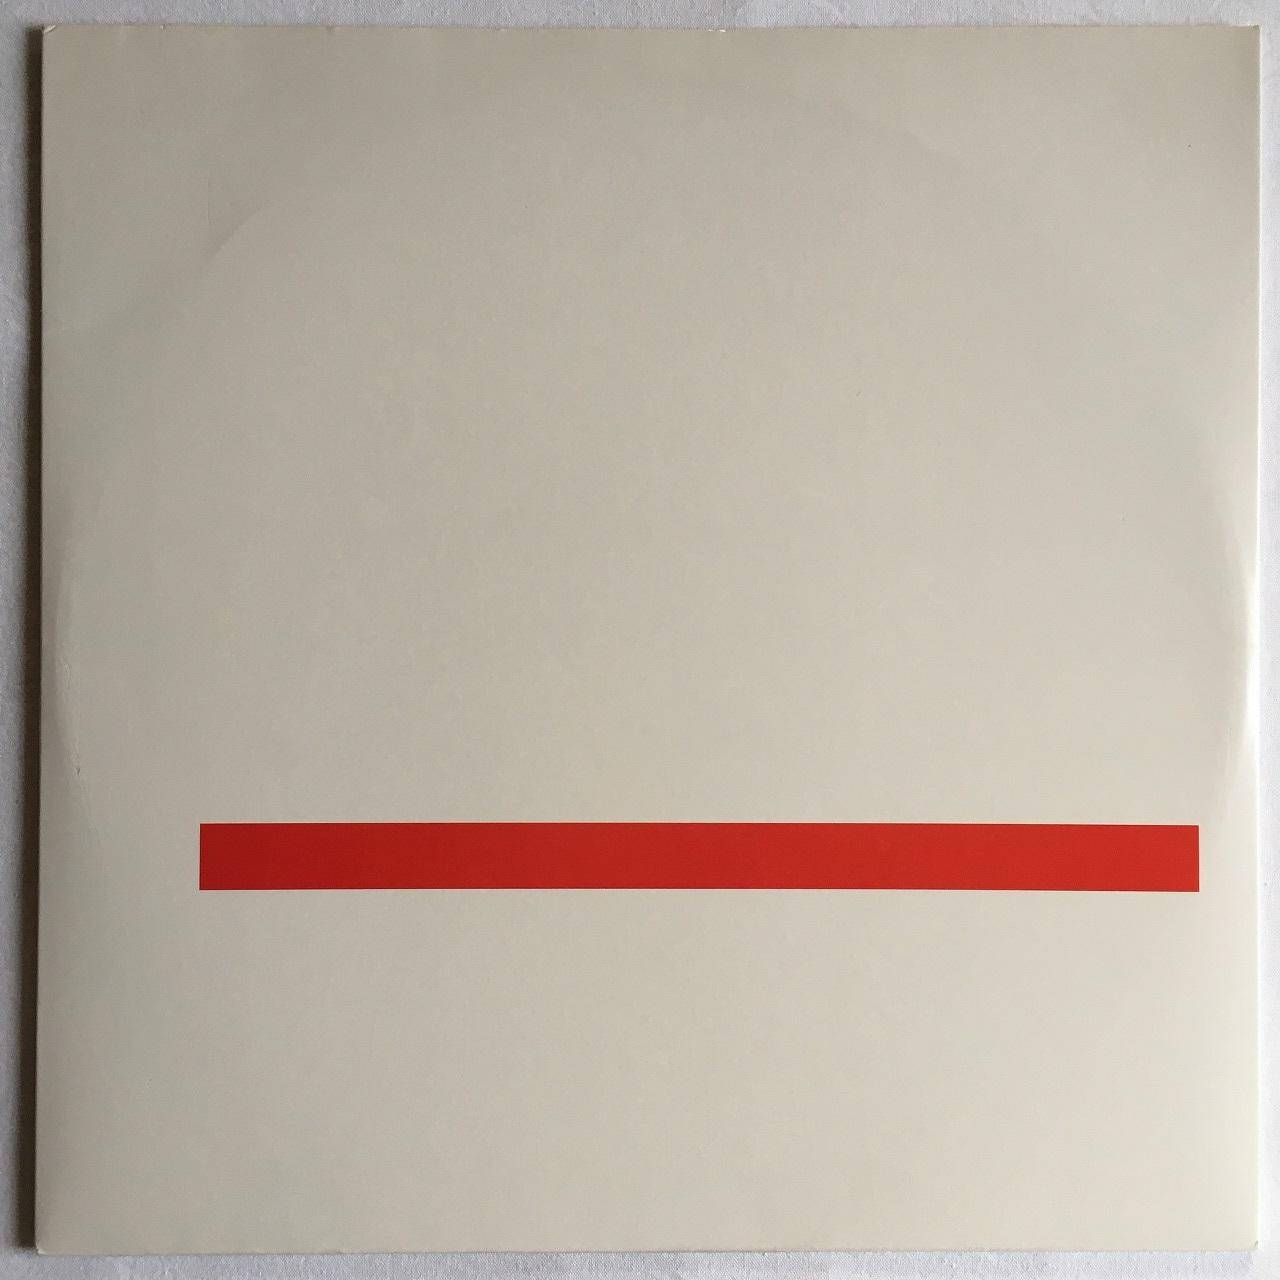 【12inch x 2・米盤】New Order / Crystal